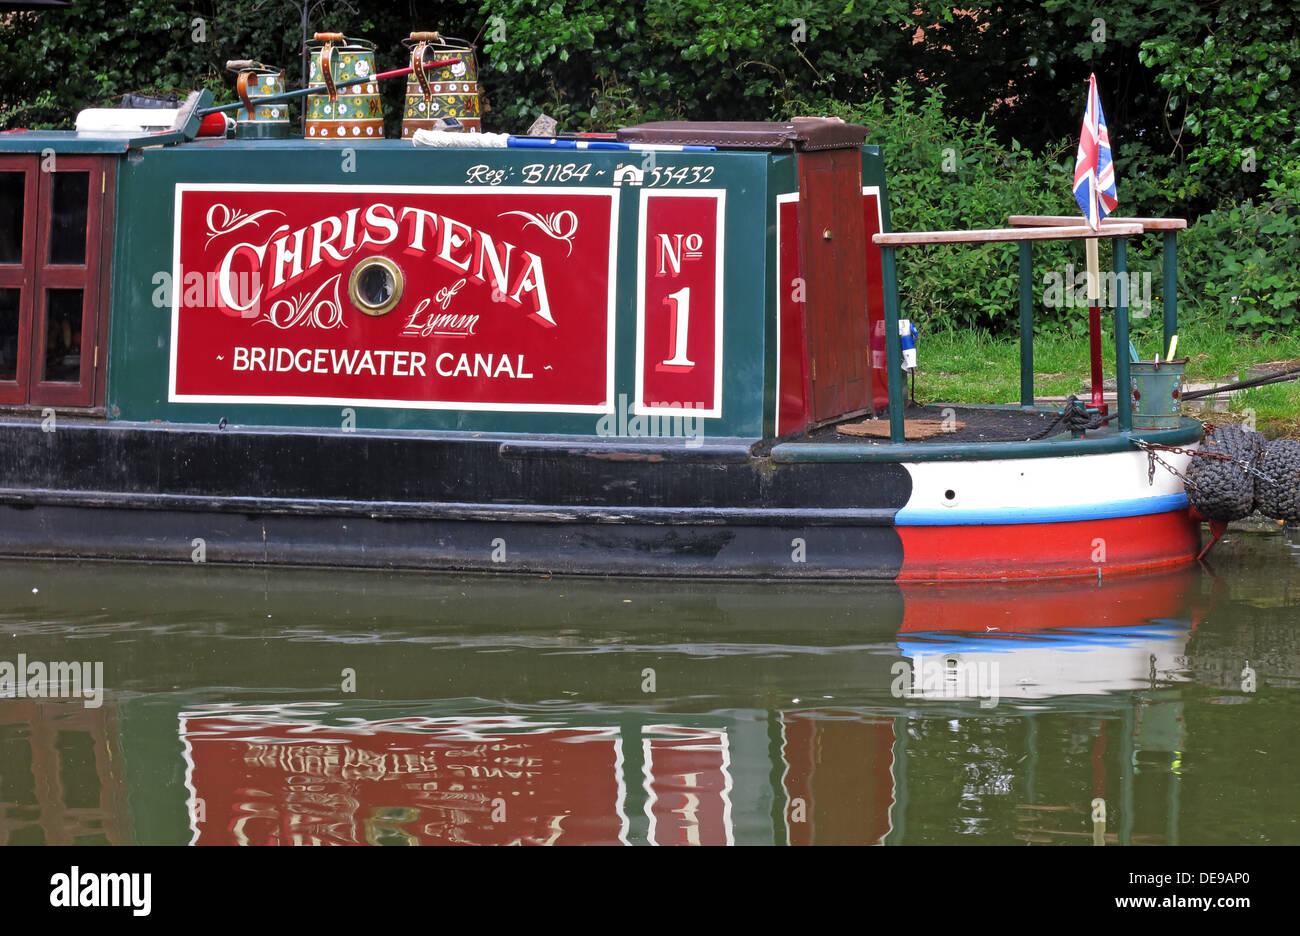 Laden Sie dieses Alamy Stockfoto Bridgewater Canal barge in rot & grün, Grappenhall, Cheshire, England, UK - DE9AP0